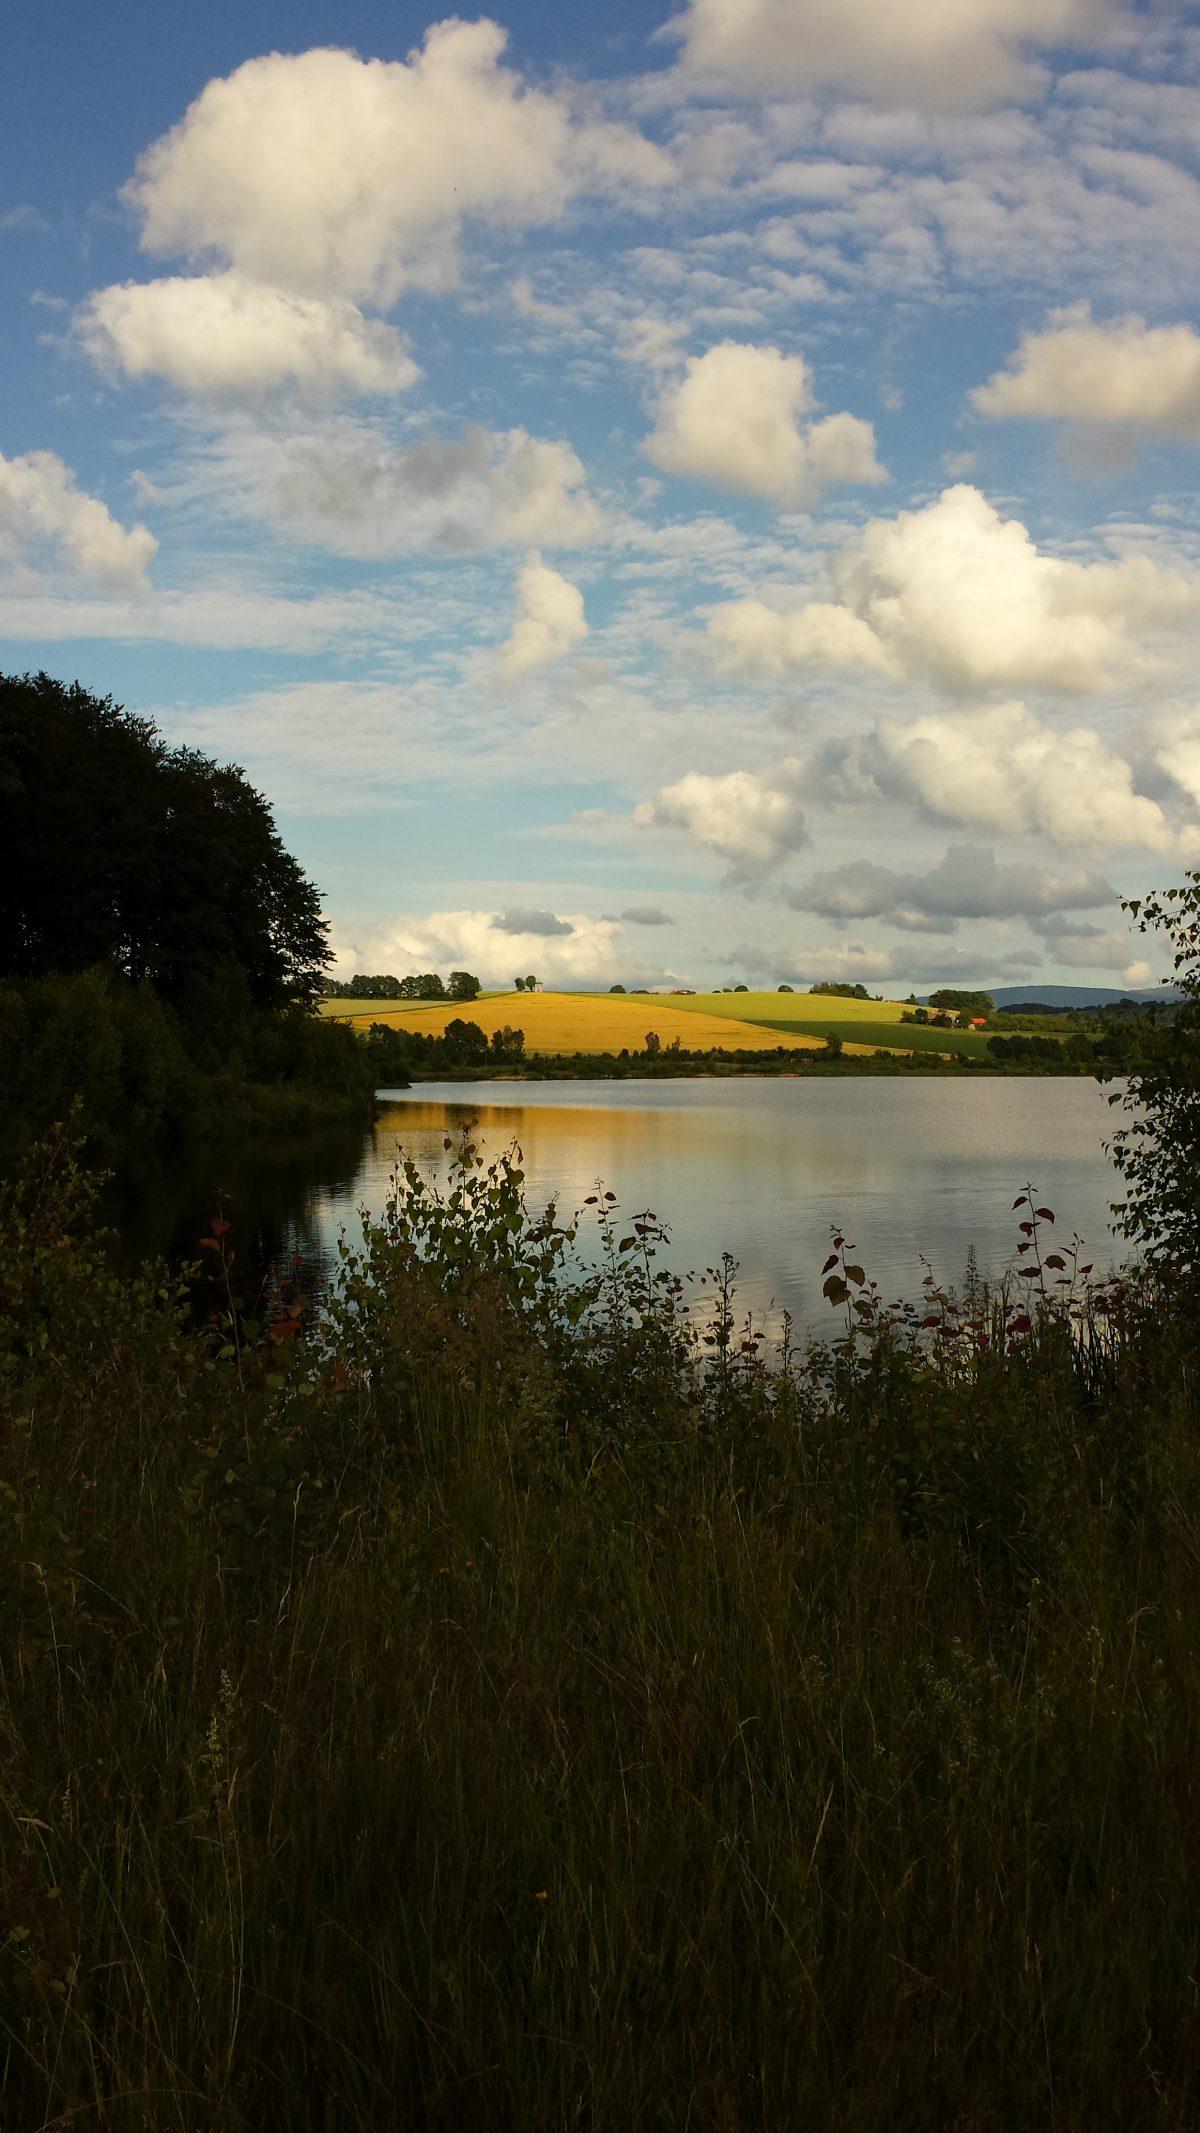 """Hunderunde"": Drachensee Furth im Wald"